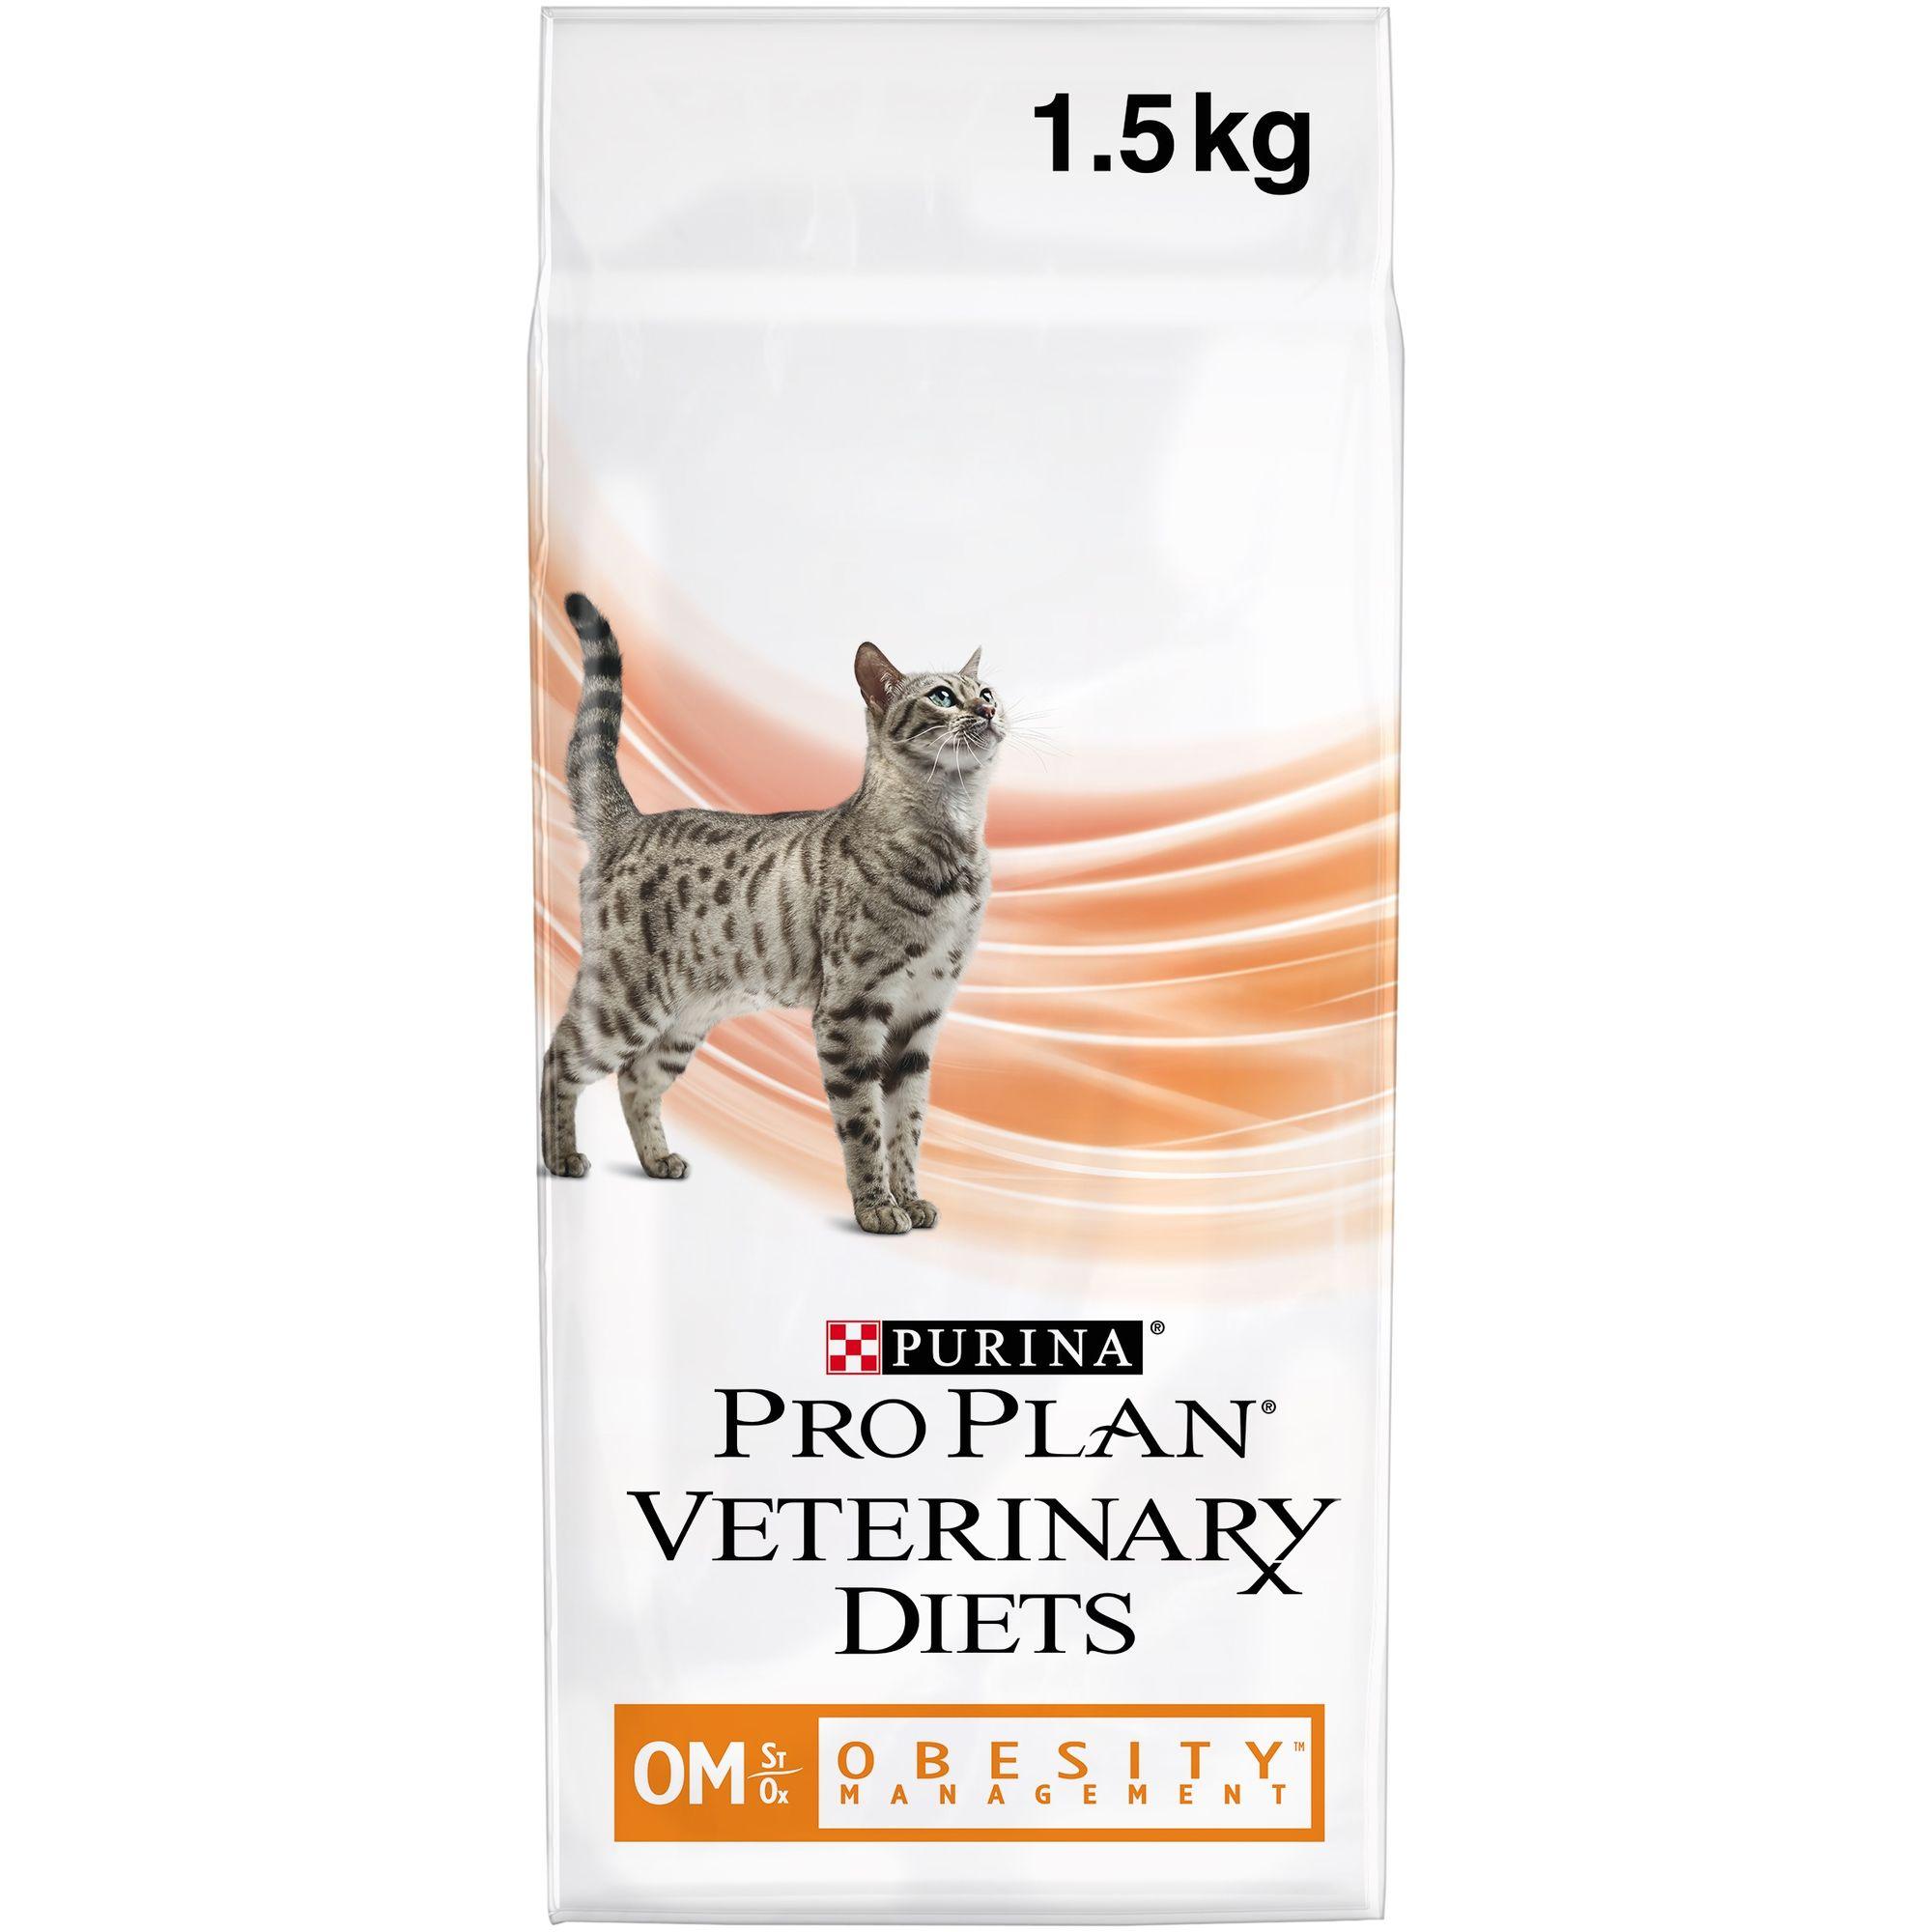 Purina Pro Plan Veterinary Diets Feline OM Obesity Management Kattenvoer